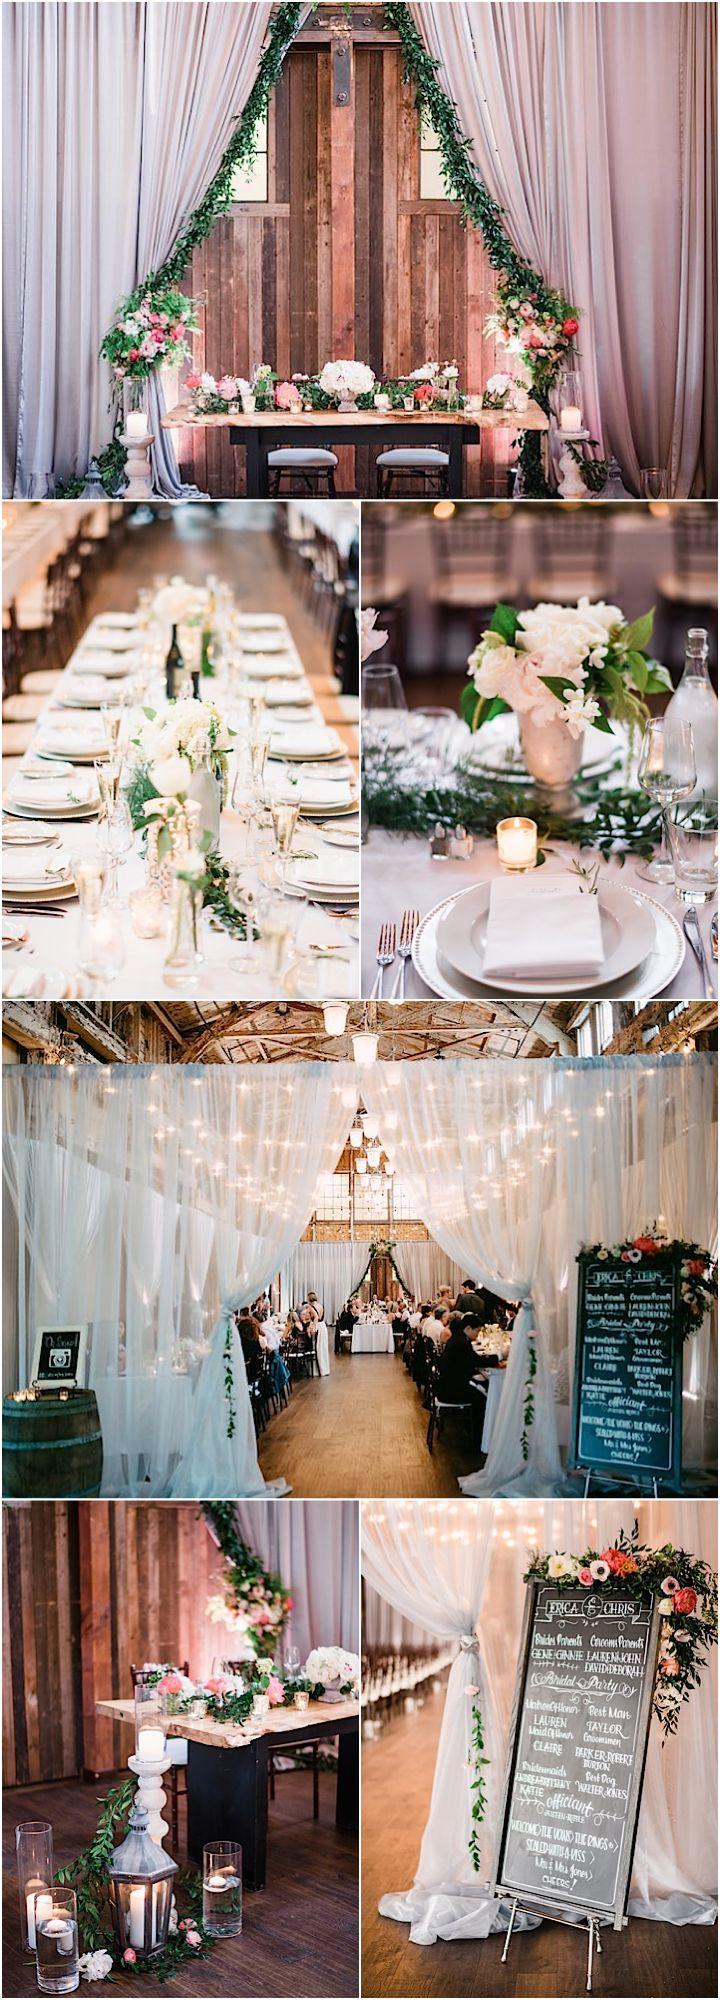 Featured Photographer: Ryan Flynn Photography; rustic chic wedding reception